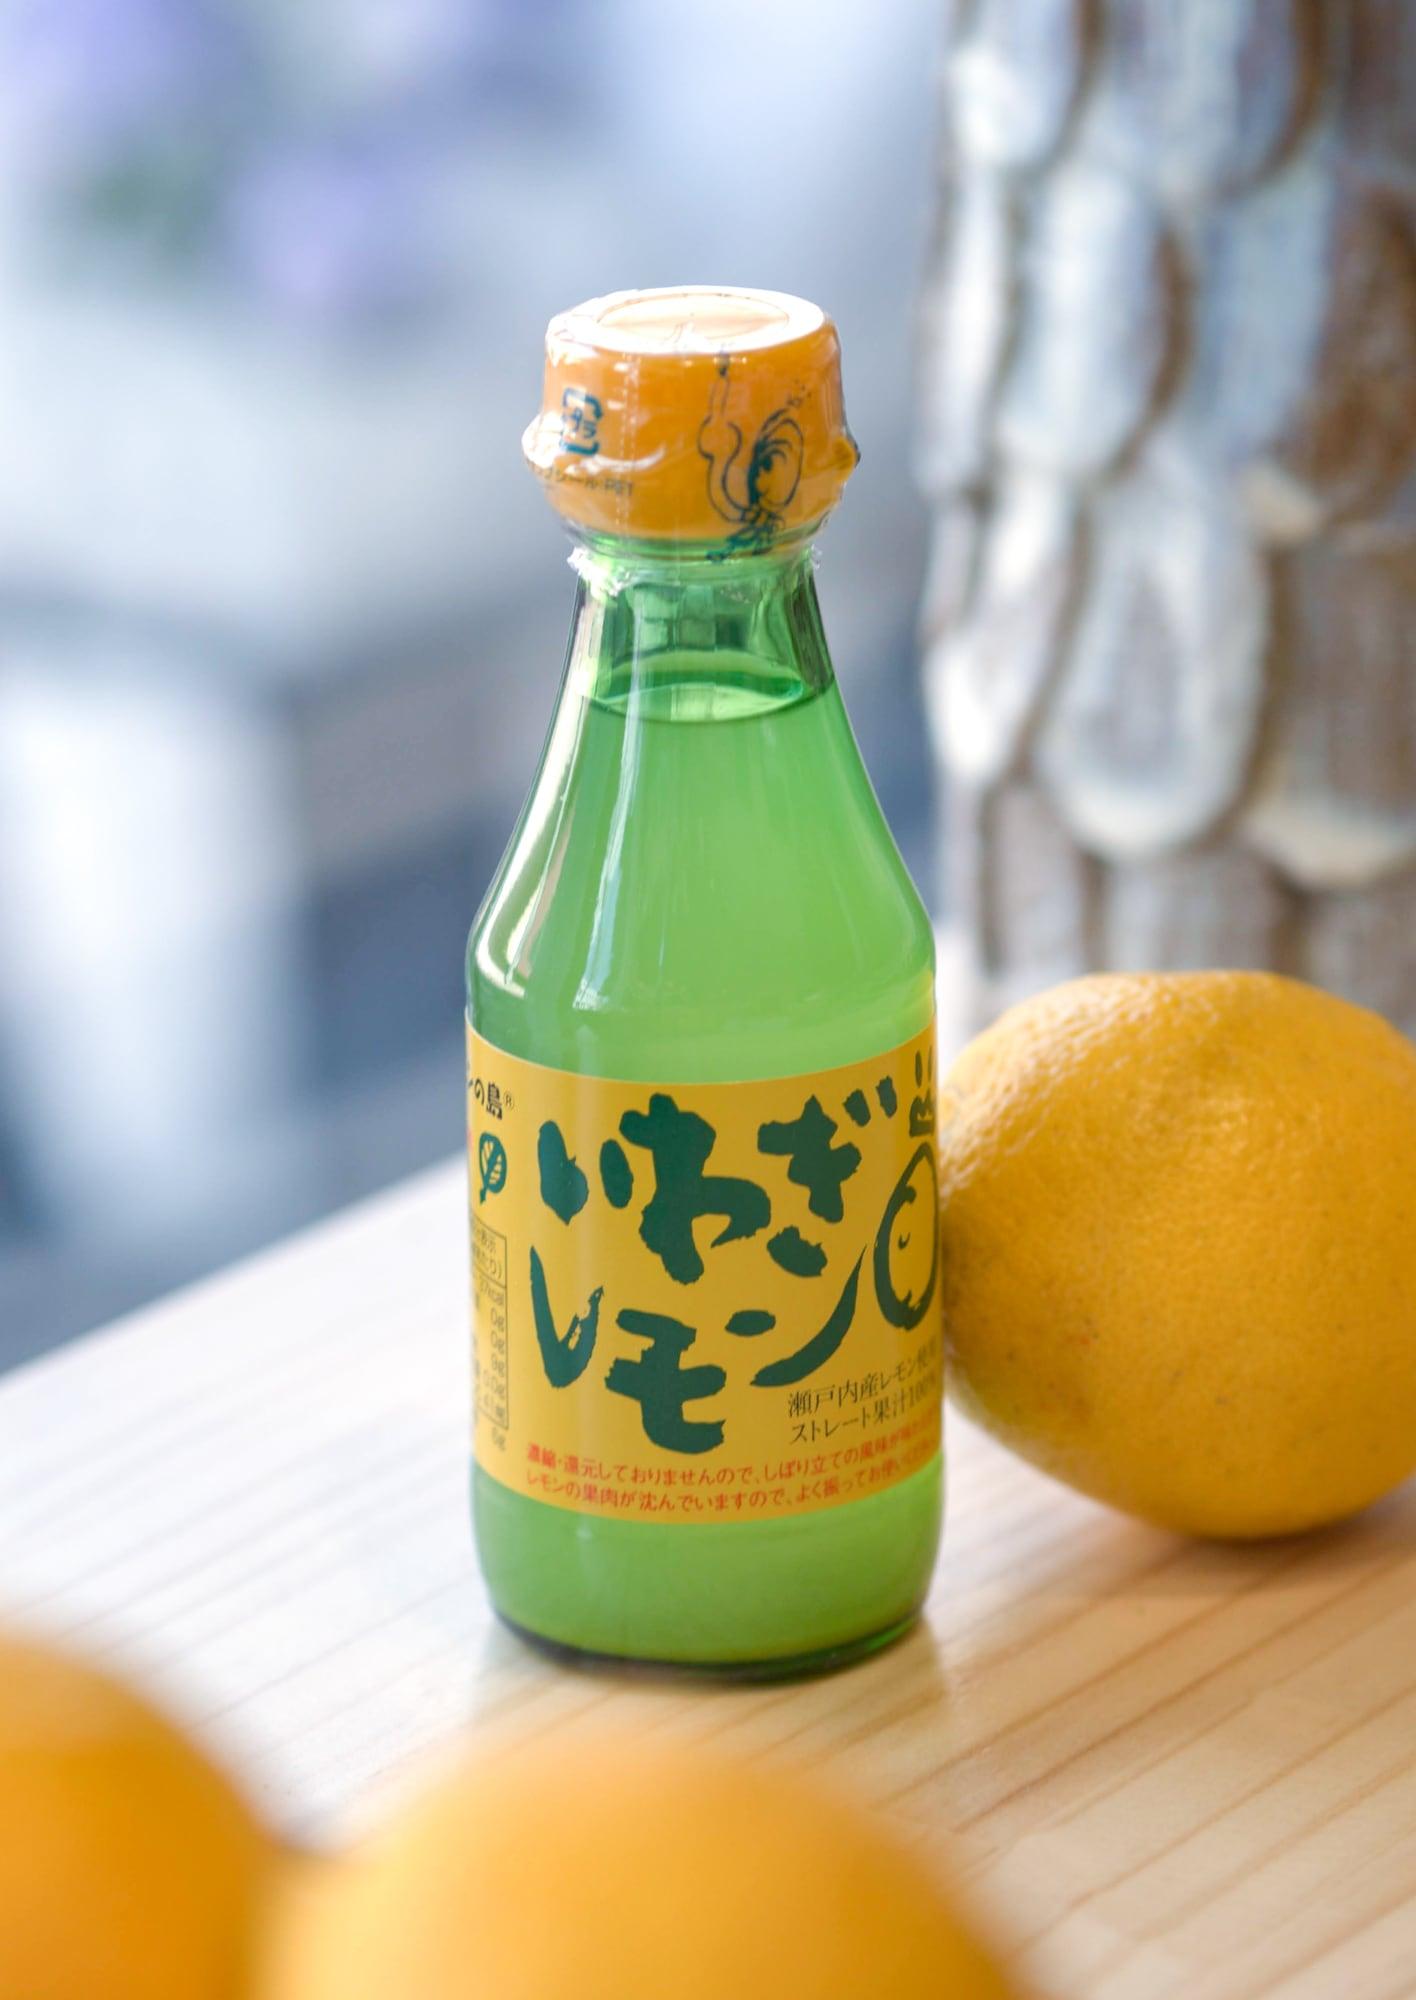 愛媛県・上島町『レモン果汁』